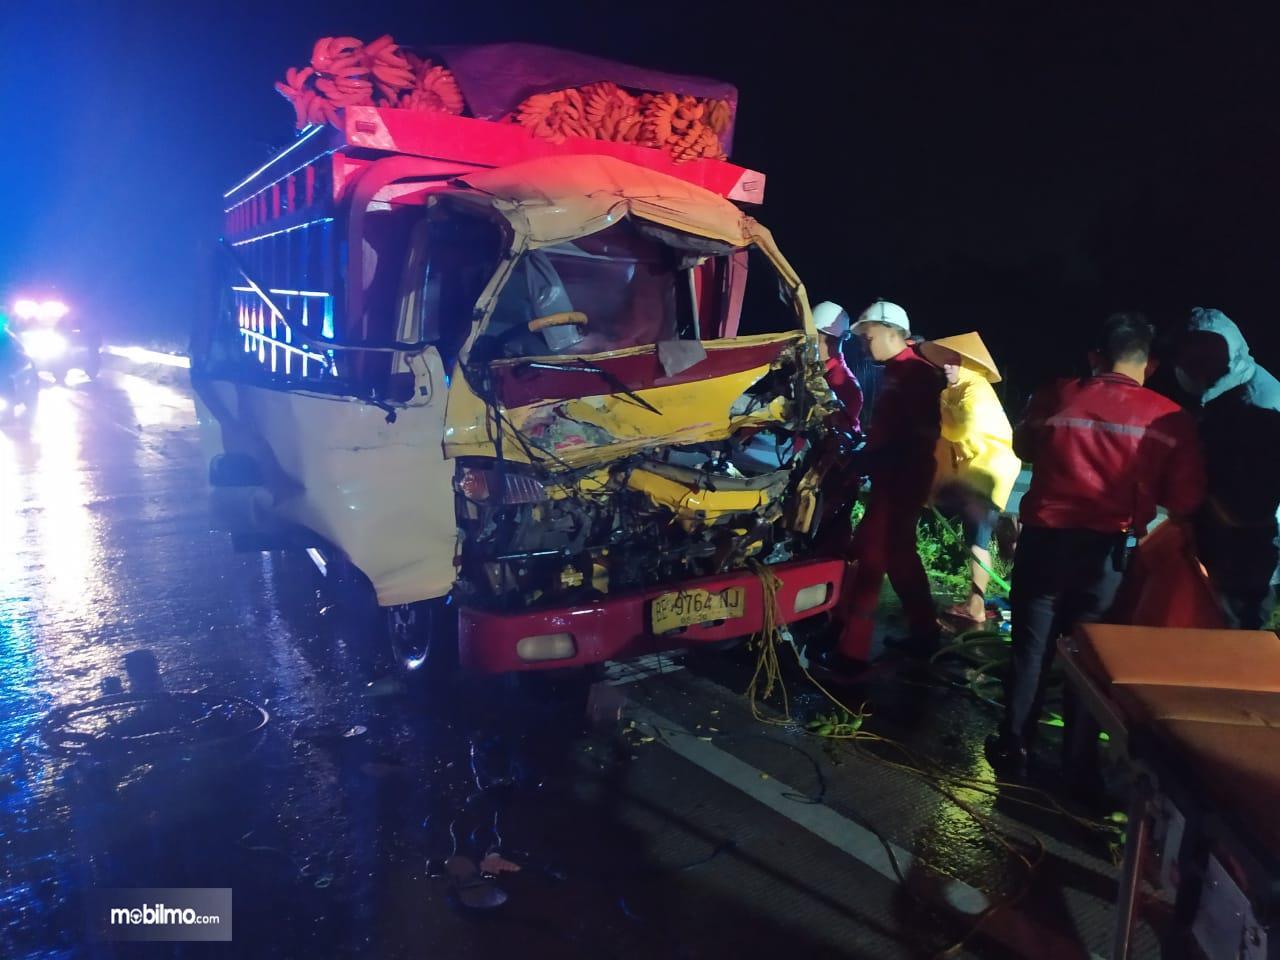 Kondisi truk BE-9764-NJ setelah mengalami kecelakaan di jalan tol trans-Sumatera (JTTS) ruas Bakauheni—Terbanggibesar jalur B KM 53.300 Desa Kupang, Kecamatan Katibung, Lampung Selatan, Kamis (6/2) dini hari. Dua penumpang truk tewas dan satu lainnya patah kaki terjepit kepala truk yang ringsek